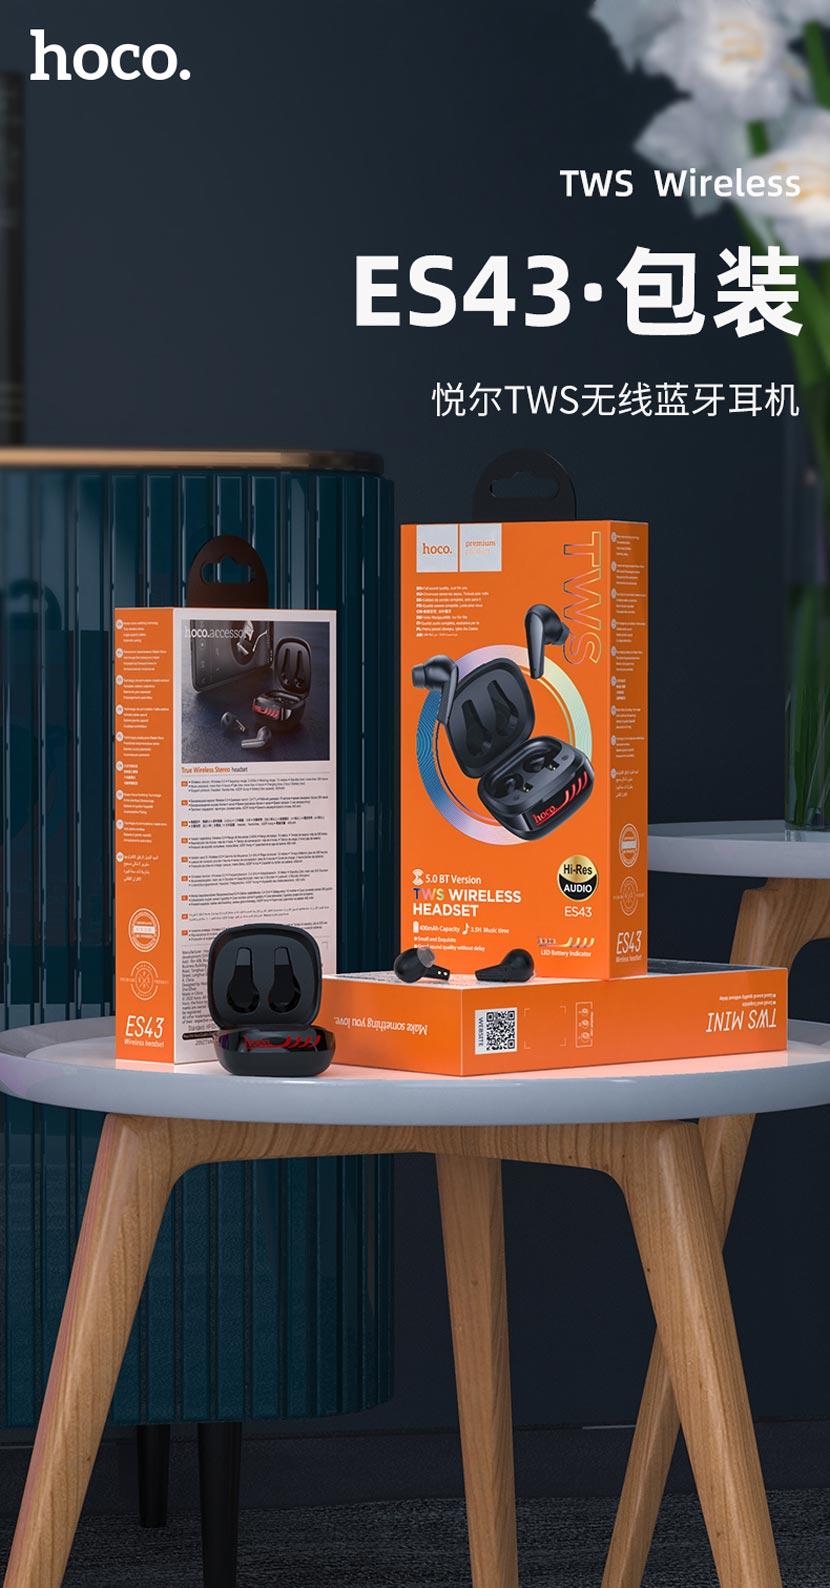 hoco news es43 lucky sound tws wireless headset package cn